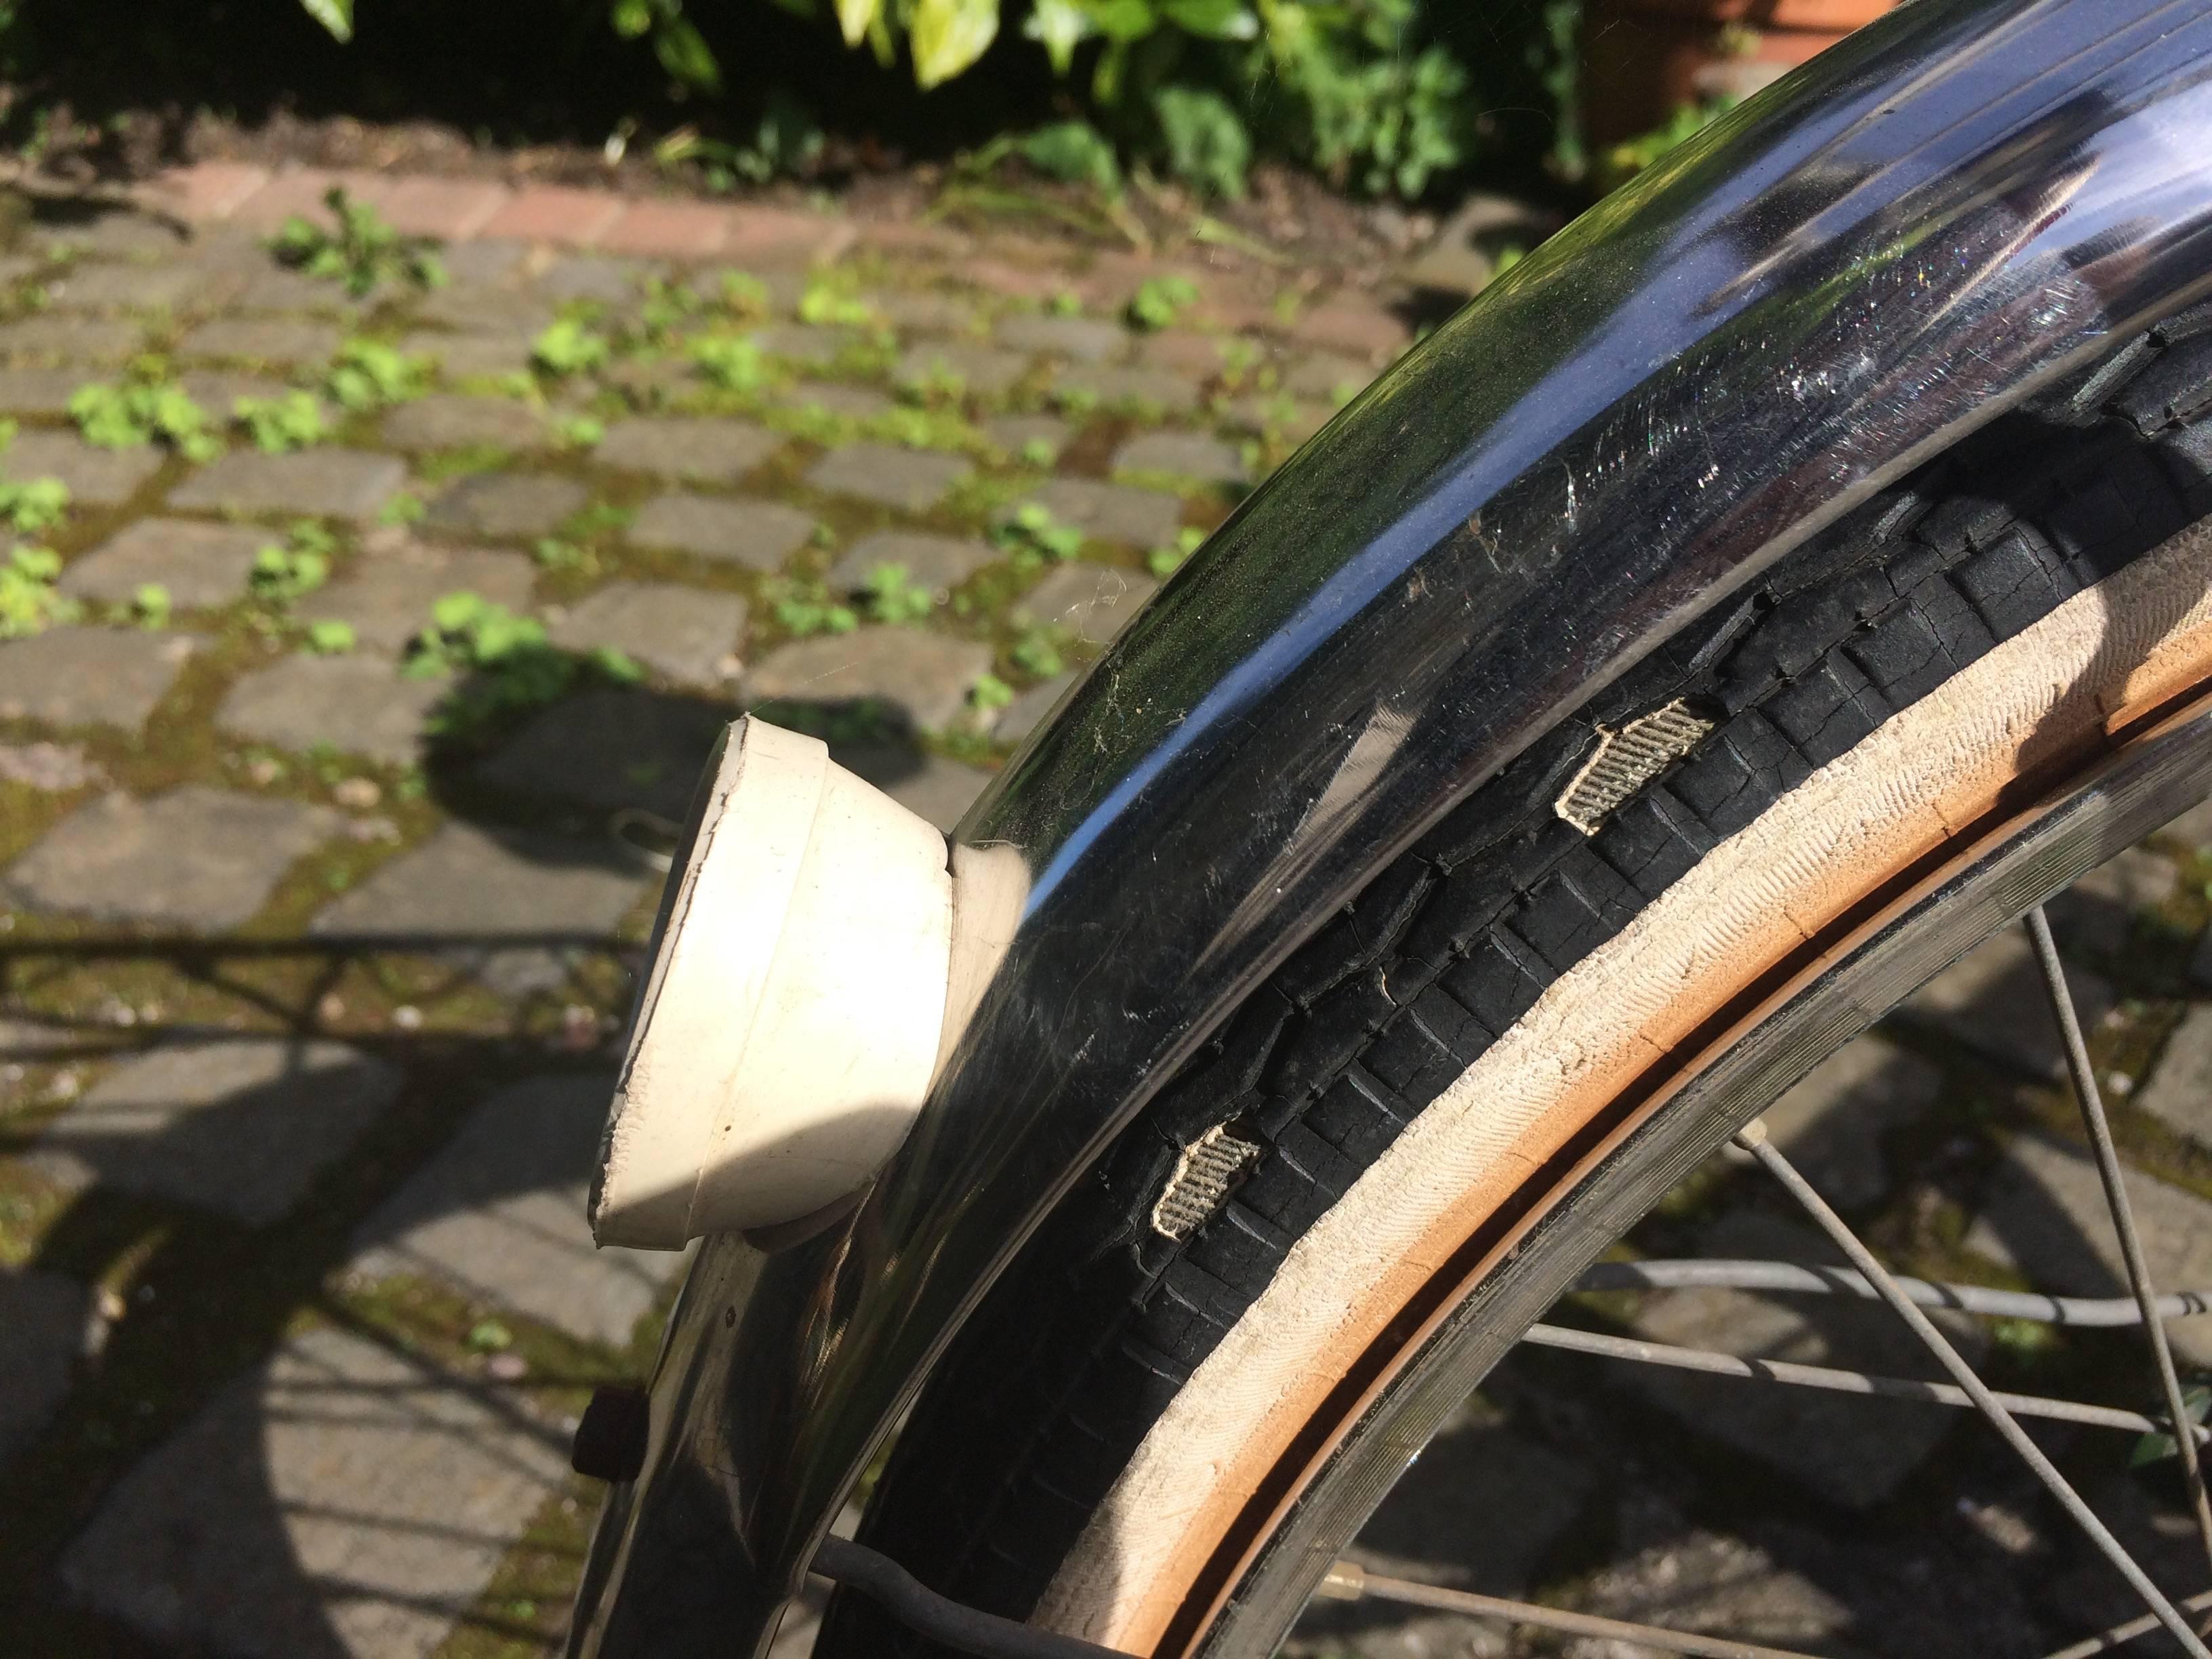 Delamination on rear tyre